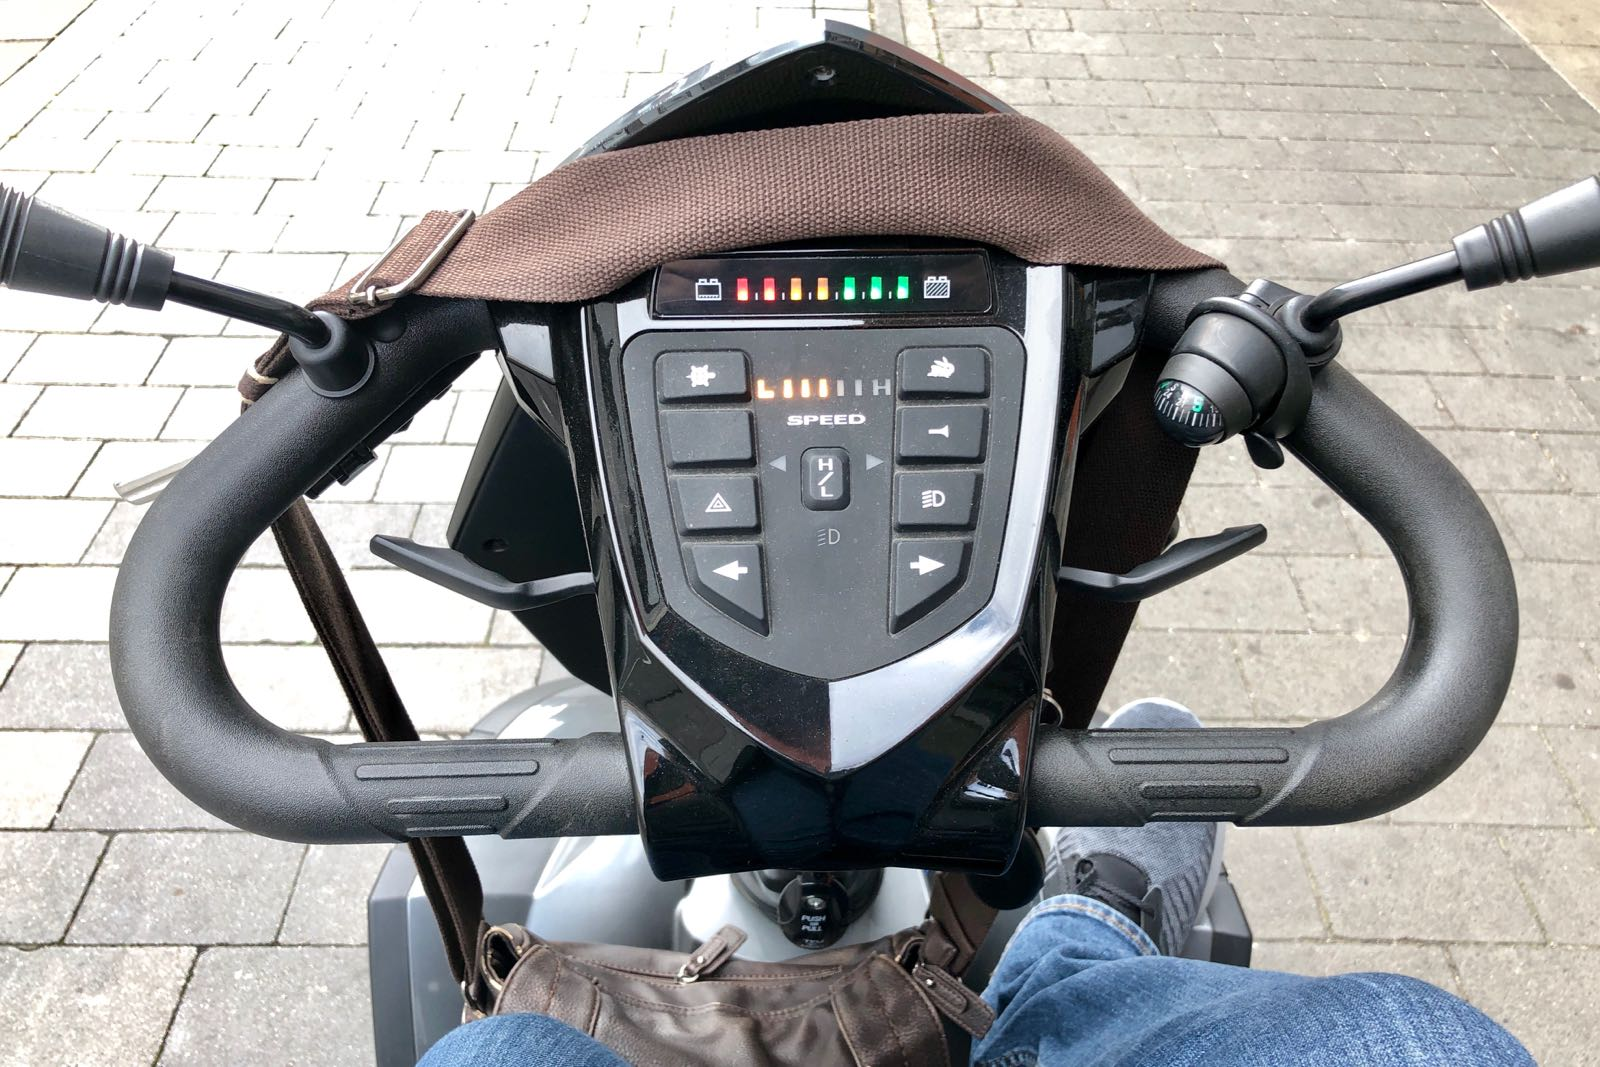 Cockpit meines E-Scooter's